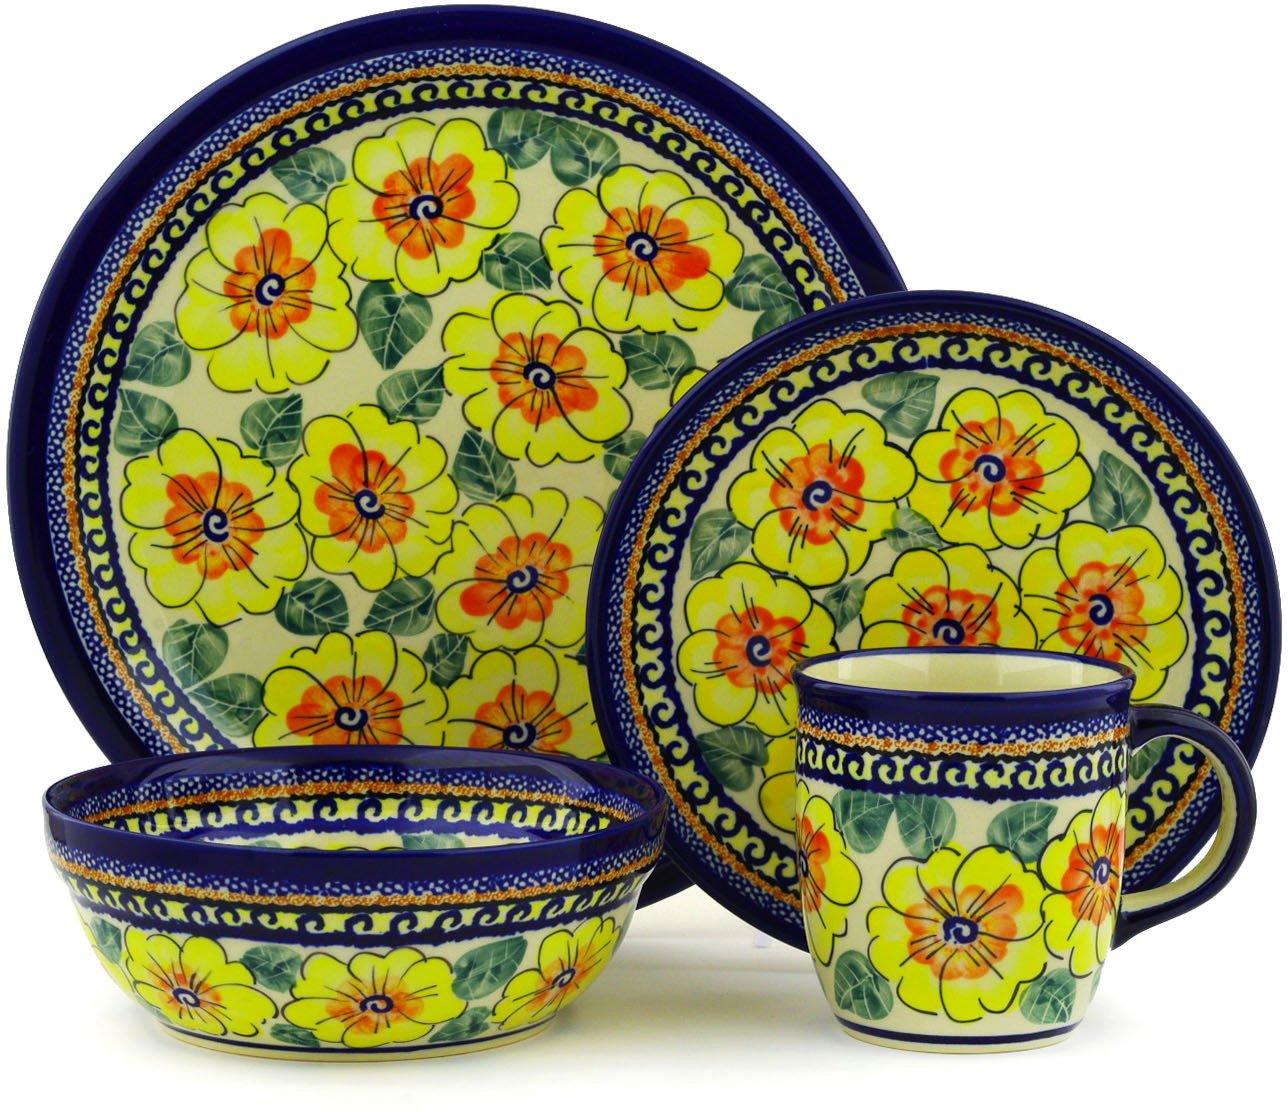 Polish Pottery 4-Piece Place Setting WAWEL (Lemon Poppies Theme) Signature UNIKAT + Certificate of Authenticity by Polmedia Polish Pottery